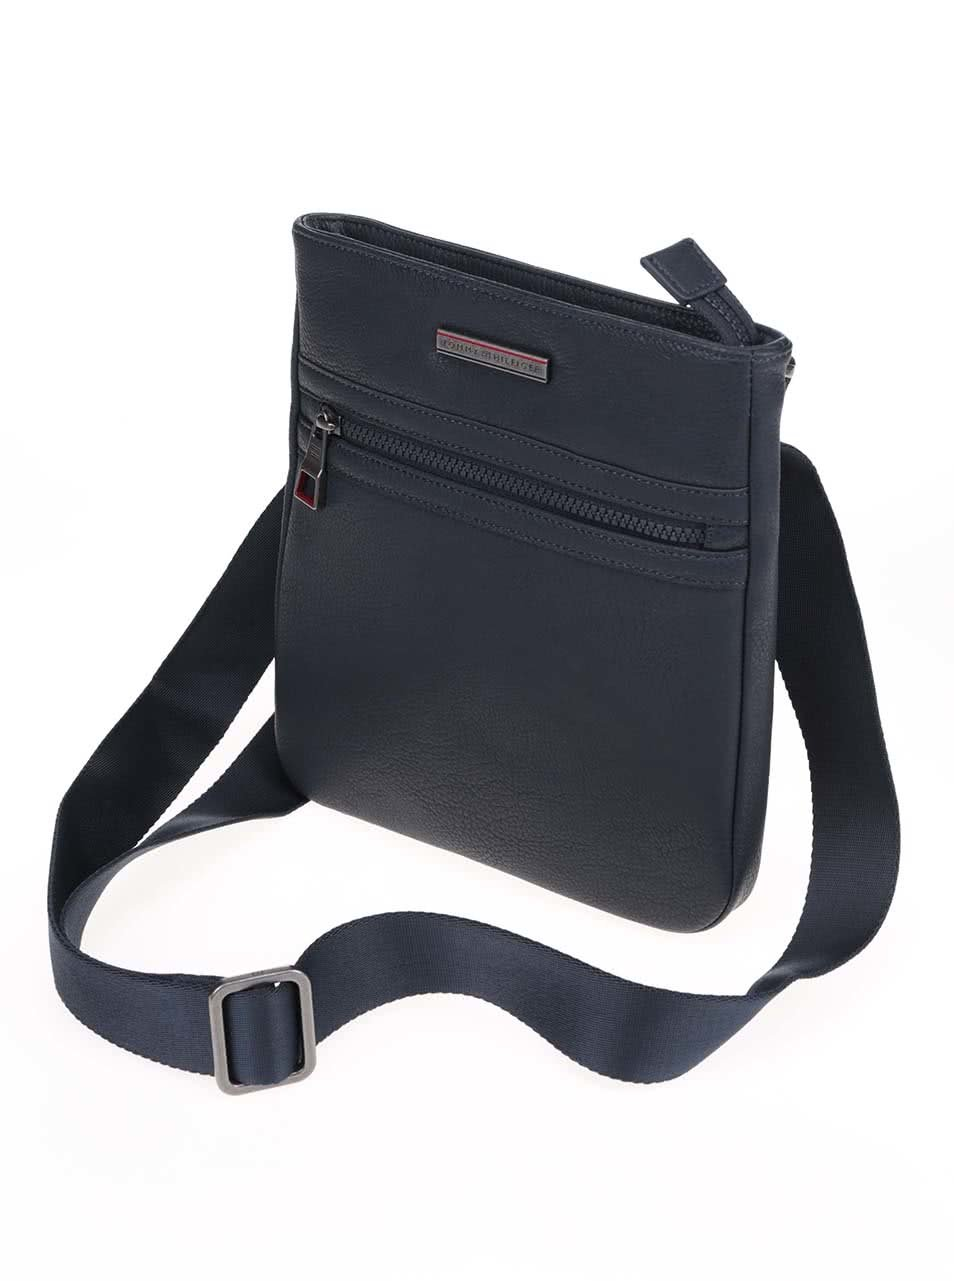 3c714d09d5 Tmavomodrá pánska taška cez rameno Tommy Hilfiger Essential ...